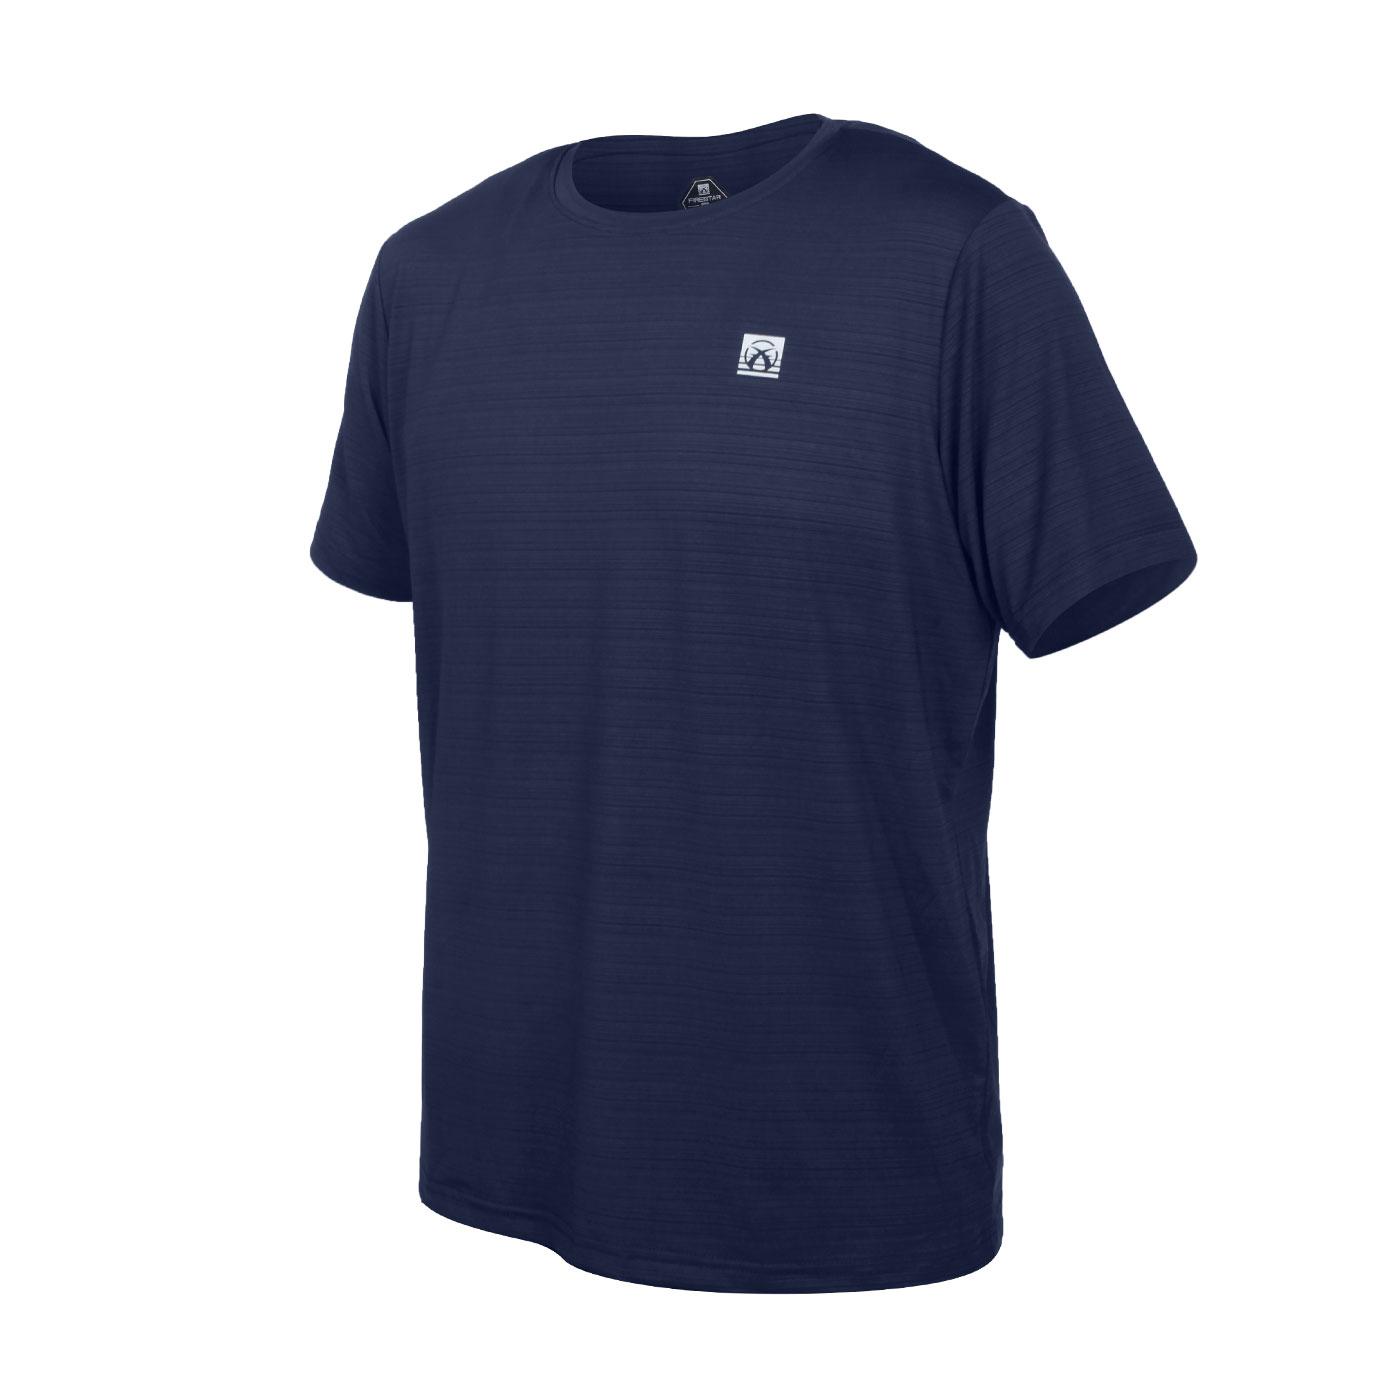 FIRESTAR 男彈性機能短袖圓領T恤 D1733-93